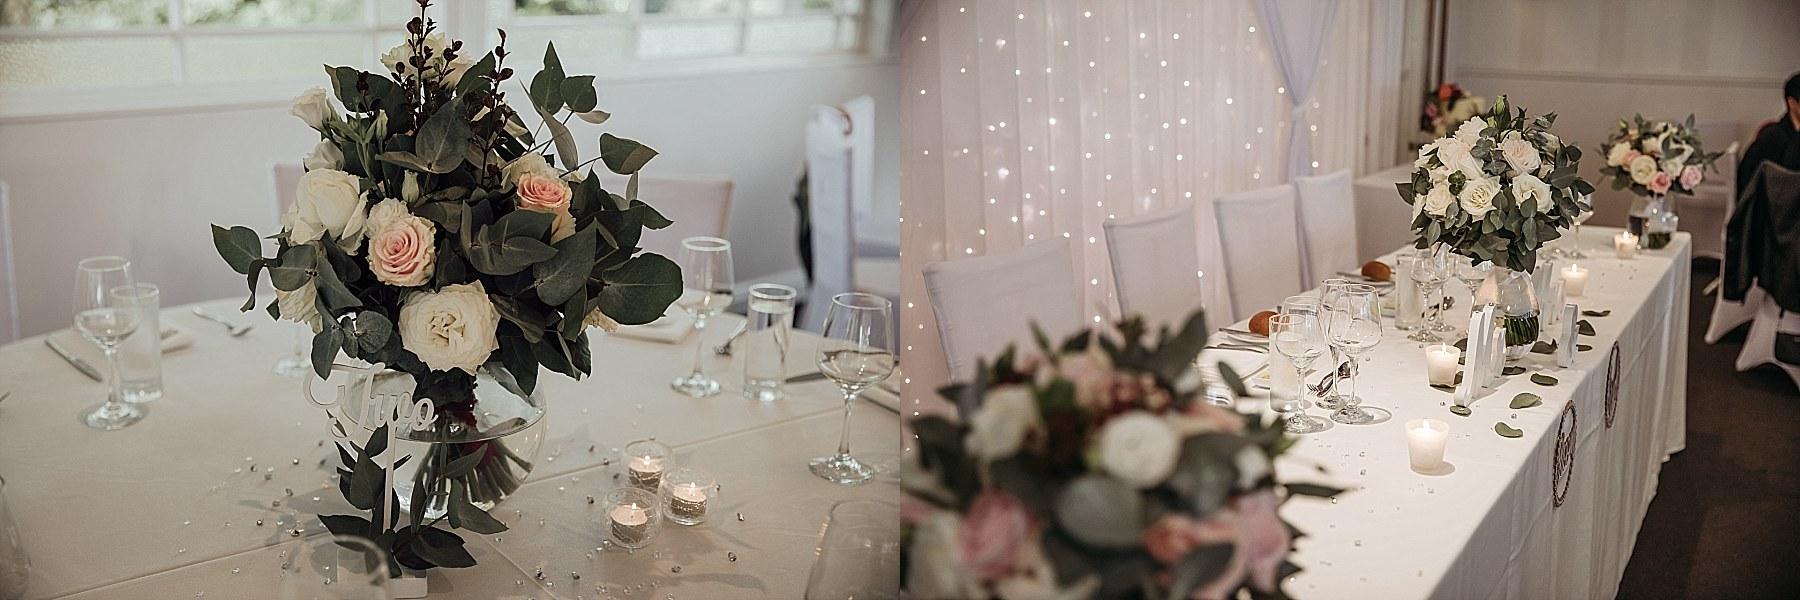 Allely Estate Wedding Auckland Wedding Photographer - Jana & Laurie_0196.jpg